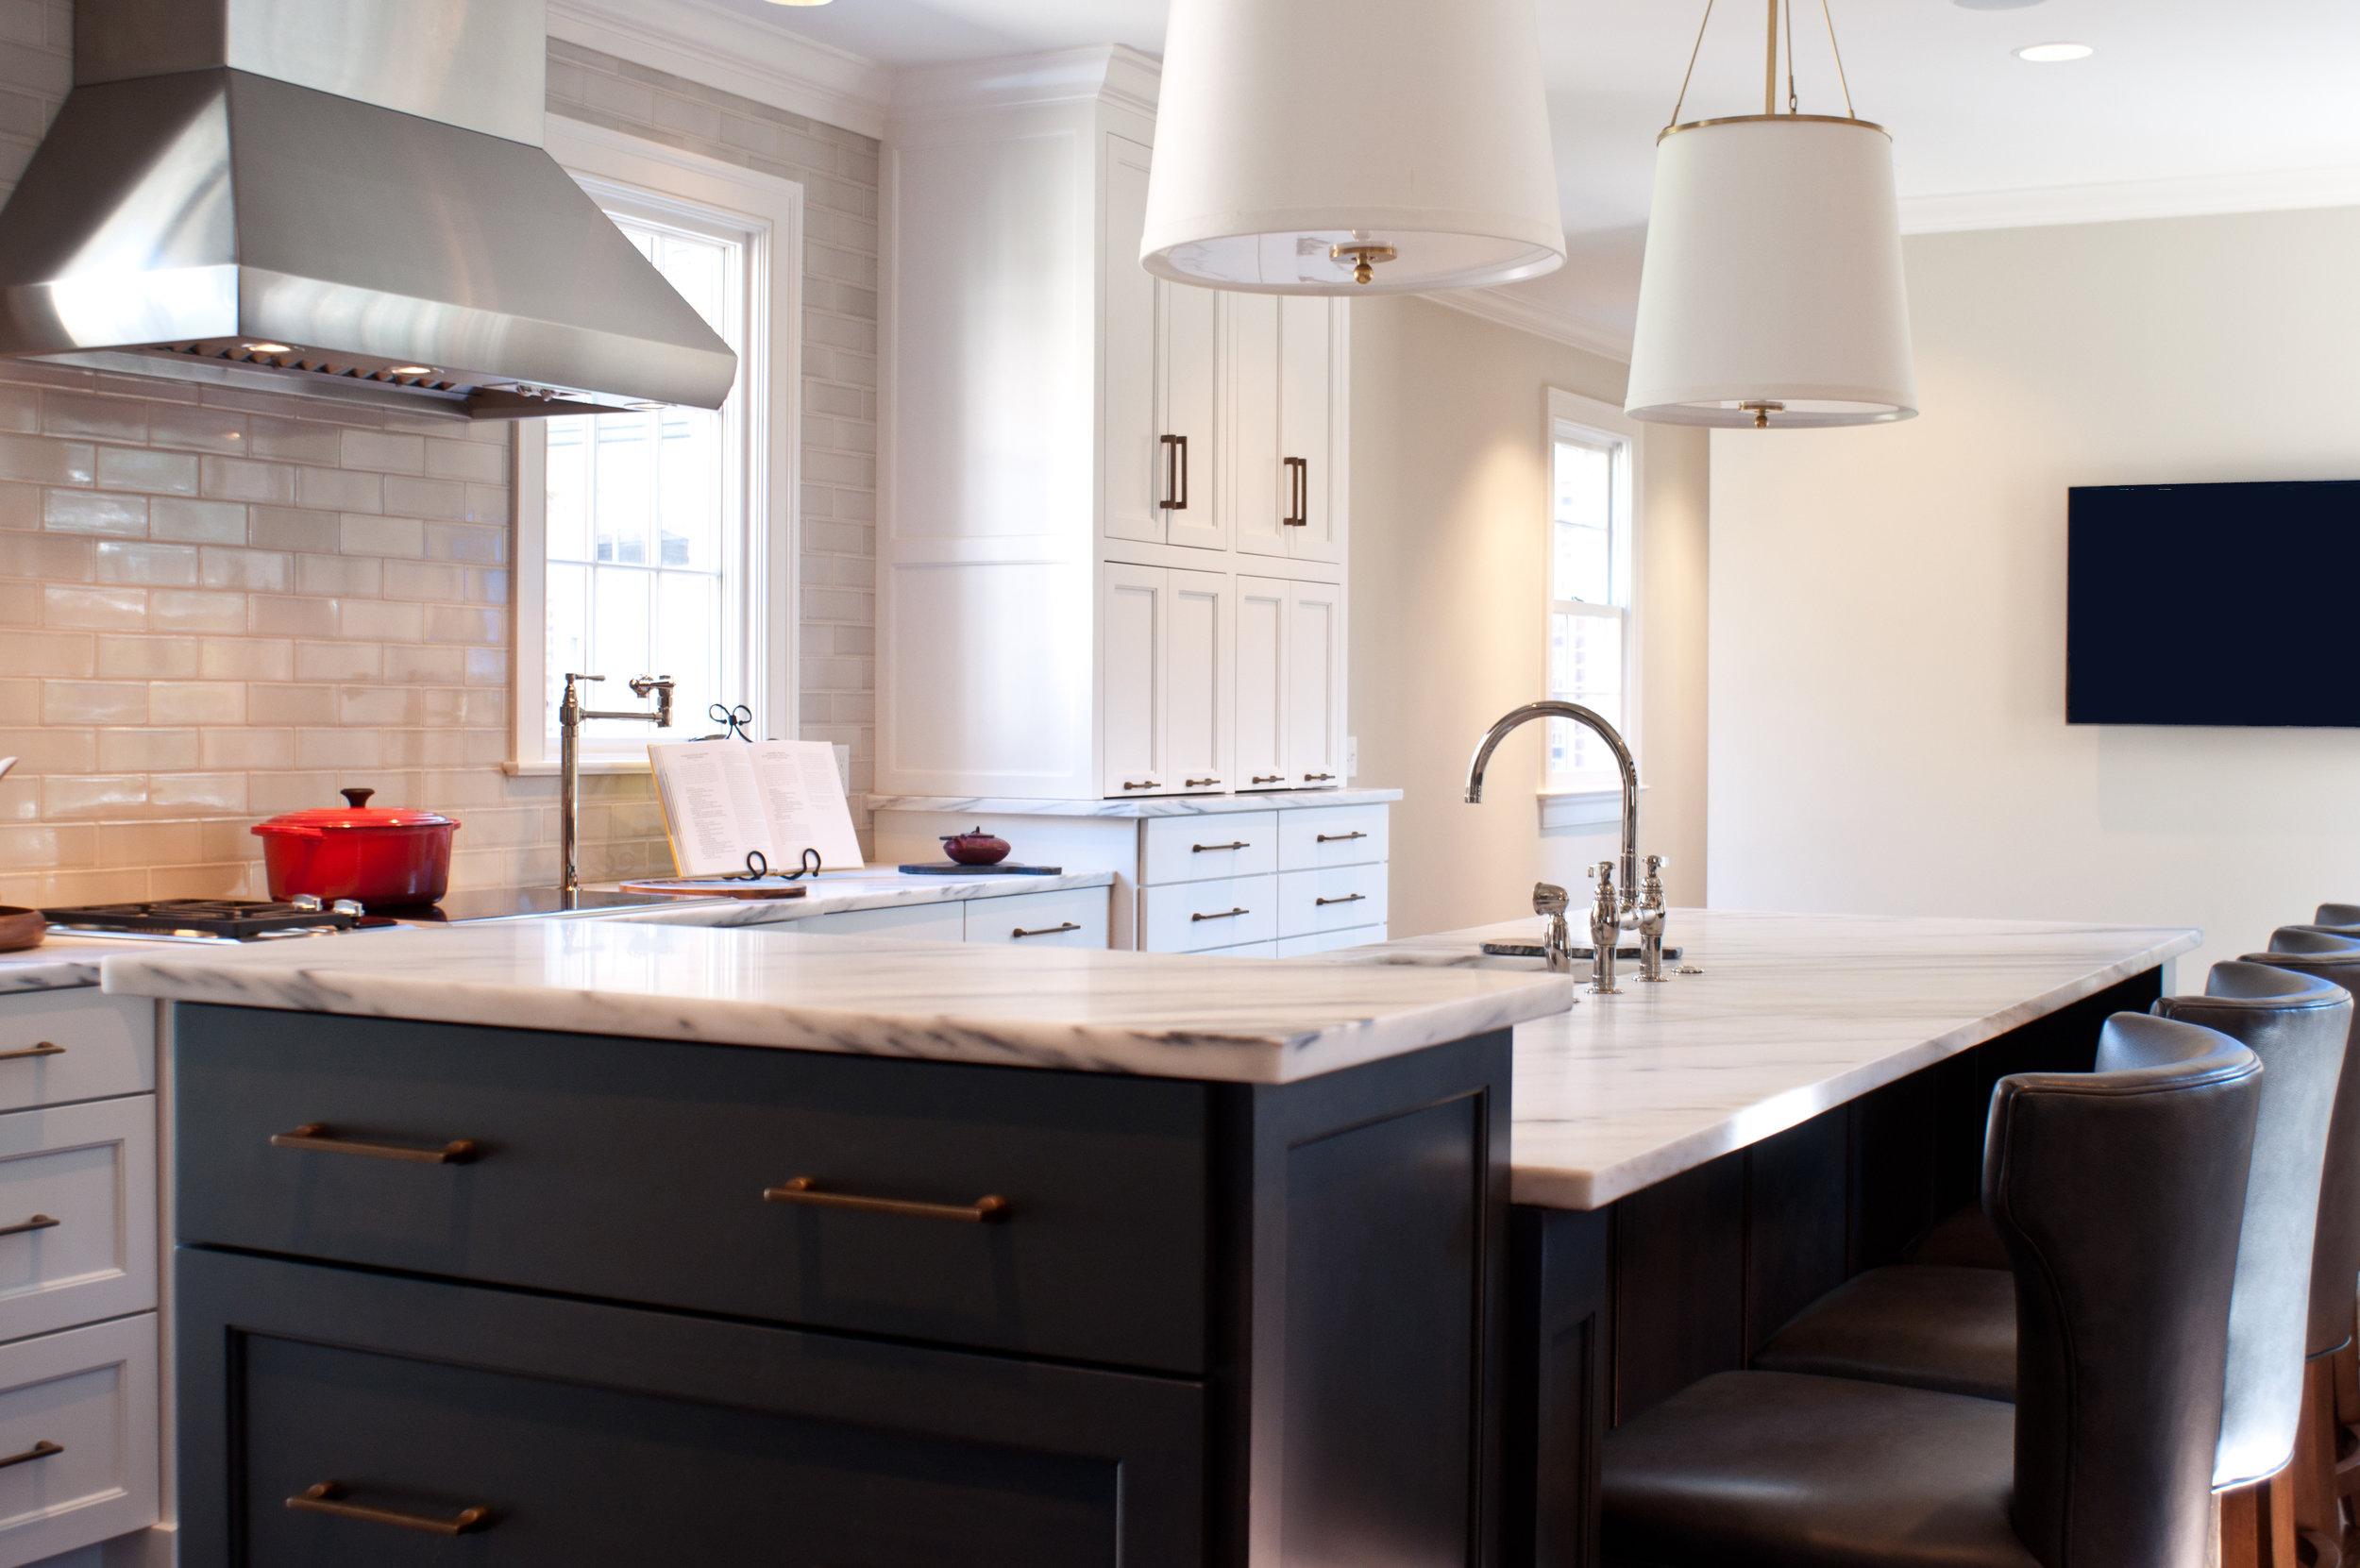 Transitional+Barrett+Kitchen+1.jpg